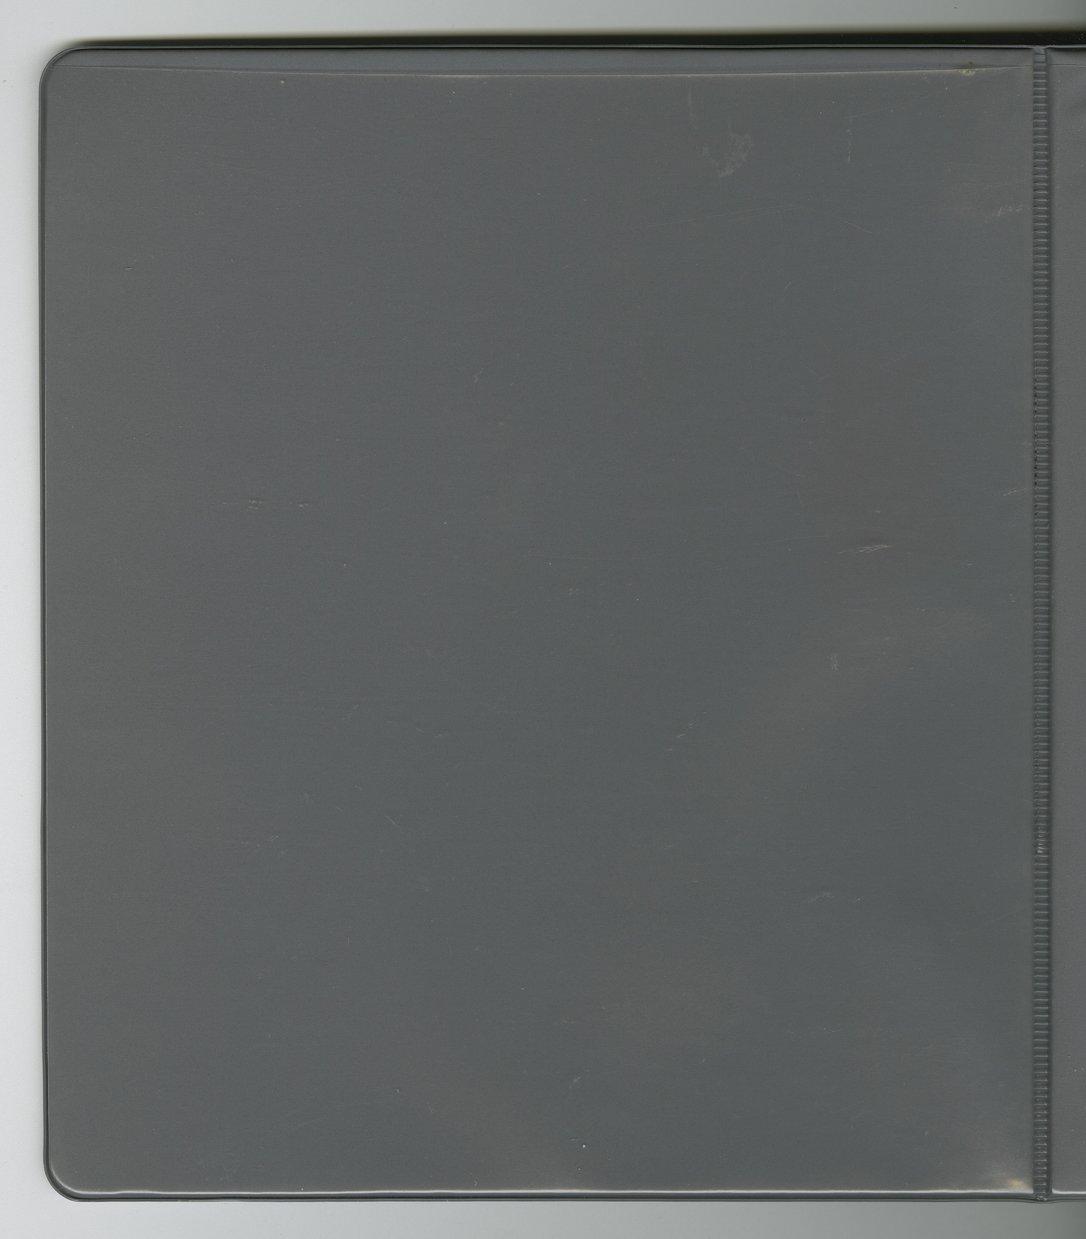 Robert Gomez military scrapbook - Back cover